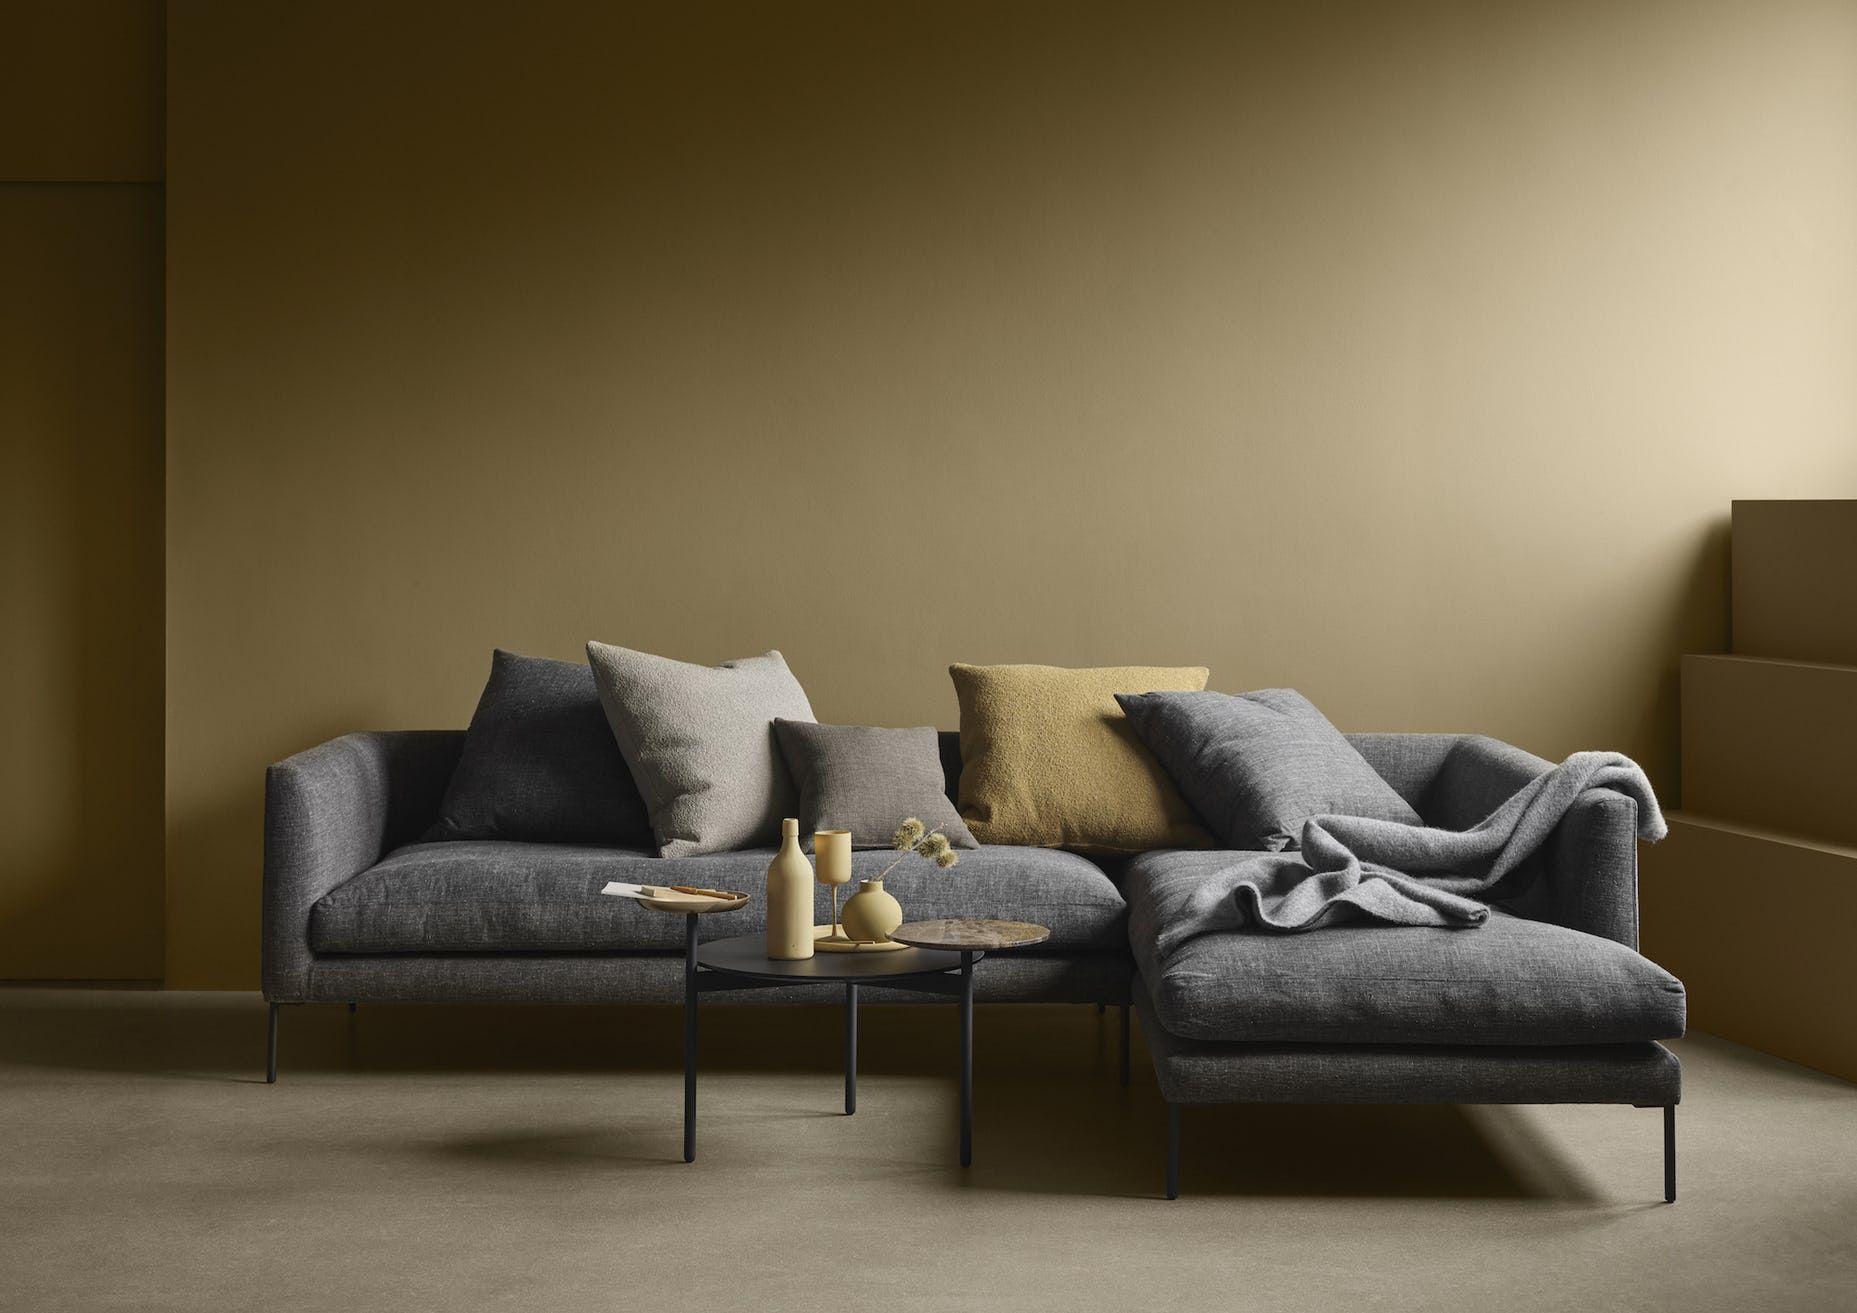 Blade Sofa By Wendelbo In 2020 Sofa Contemporary Furniture Design Sofa Design